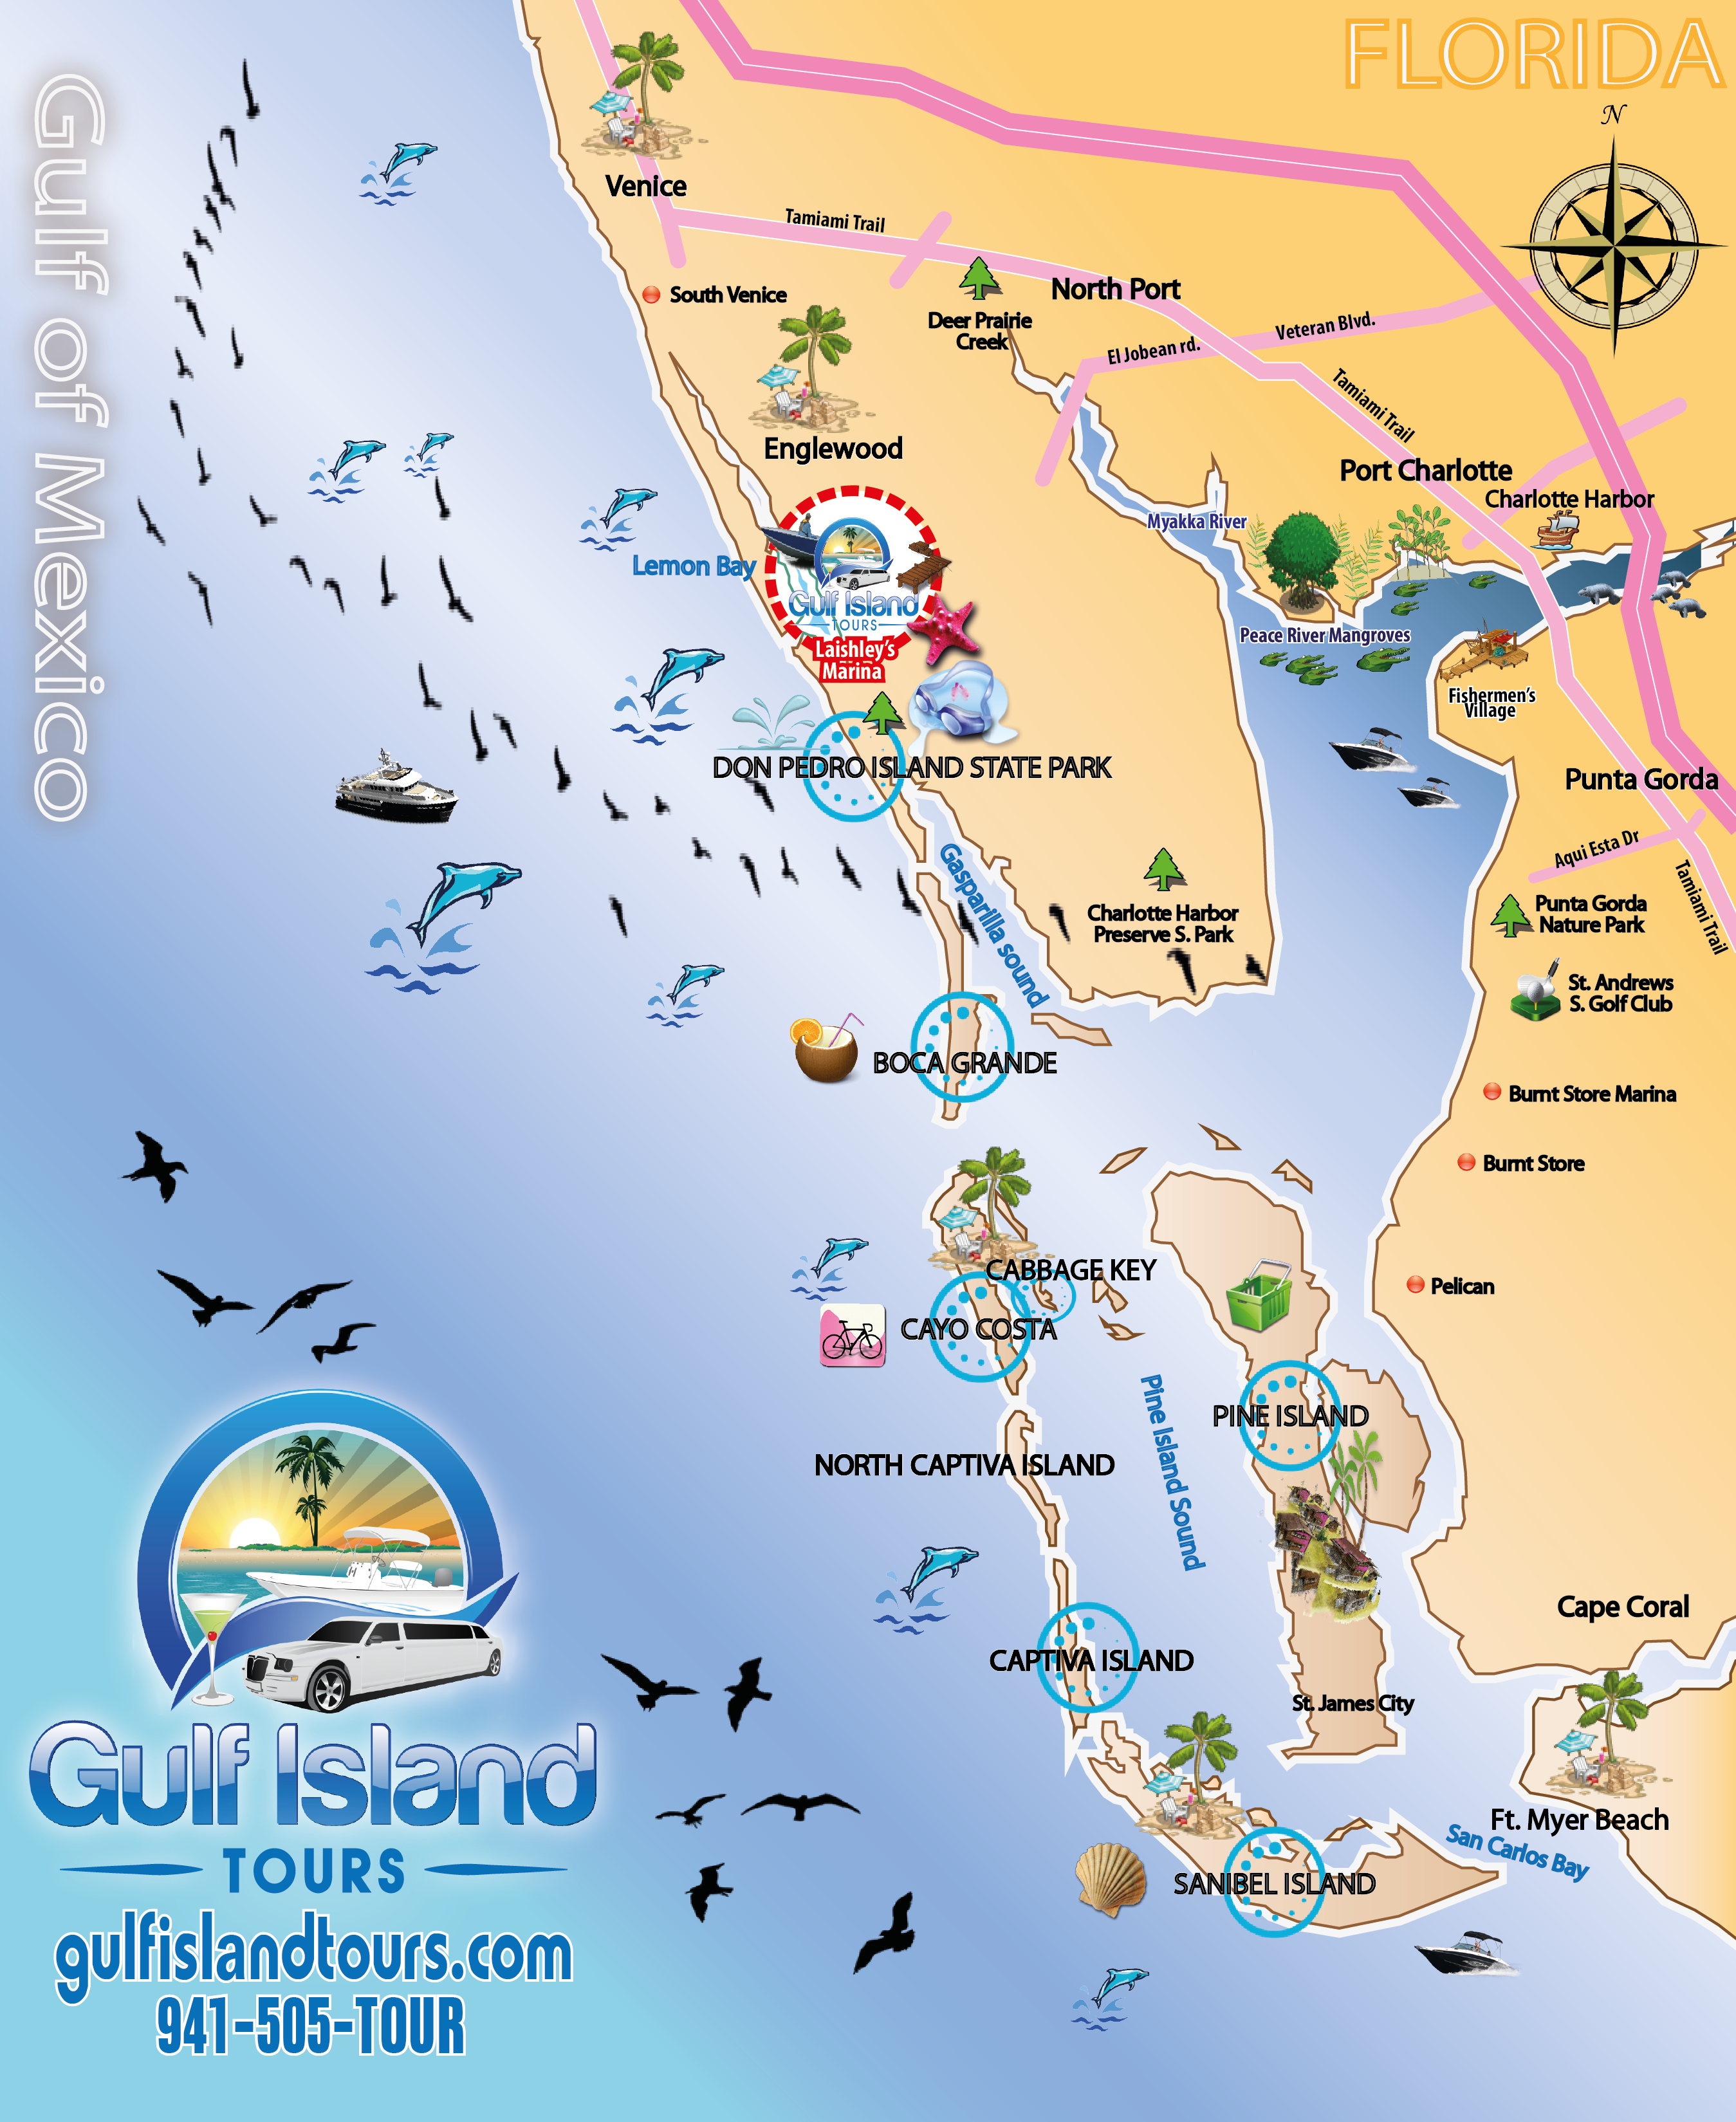 Boat Tours Englewood Fl - 941-505-8687 - Gulf Island Tours Offers - Florida Gulf Islands Map